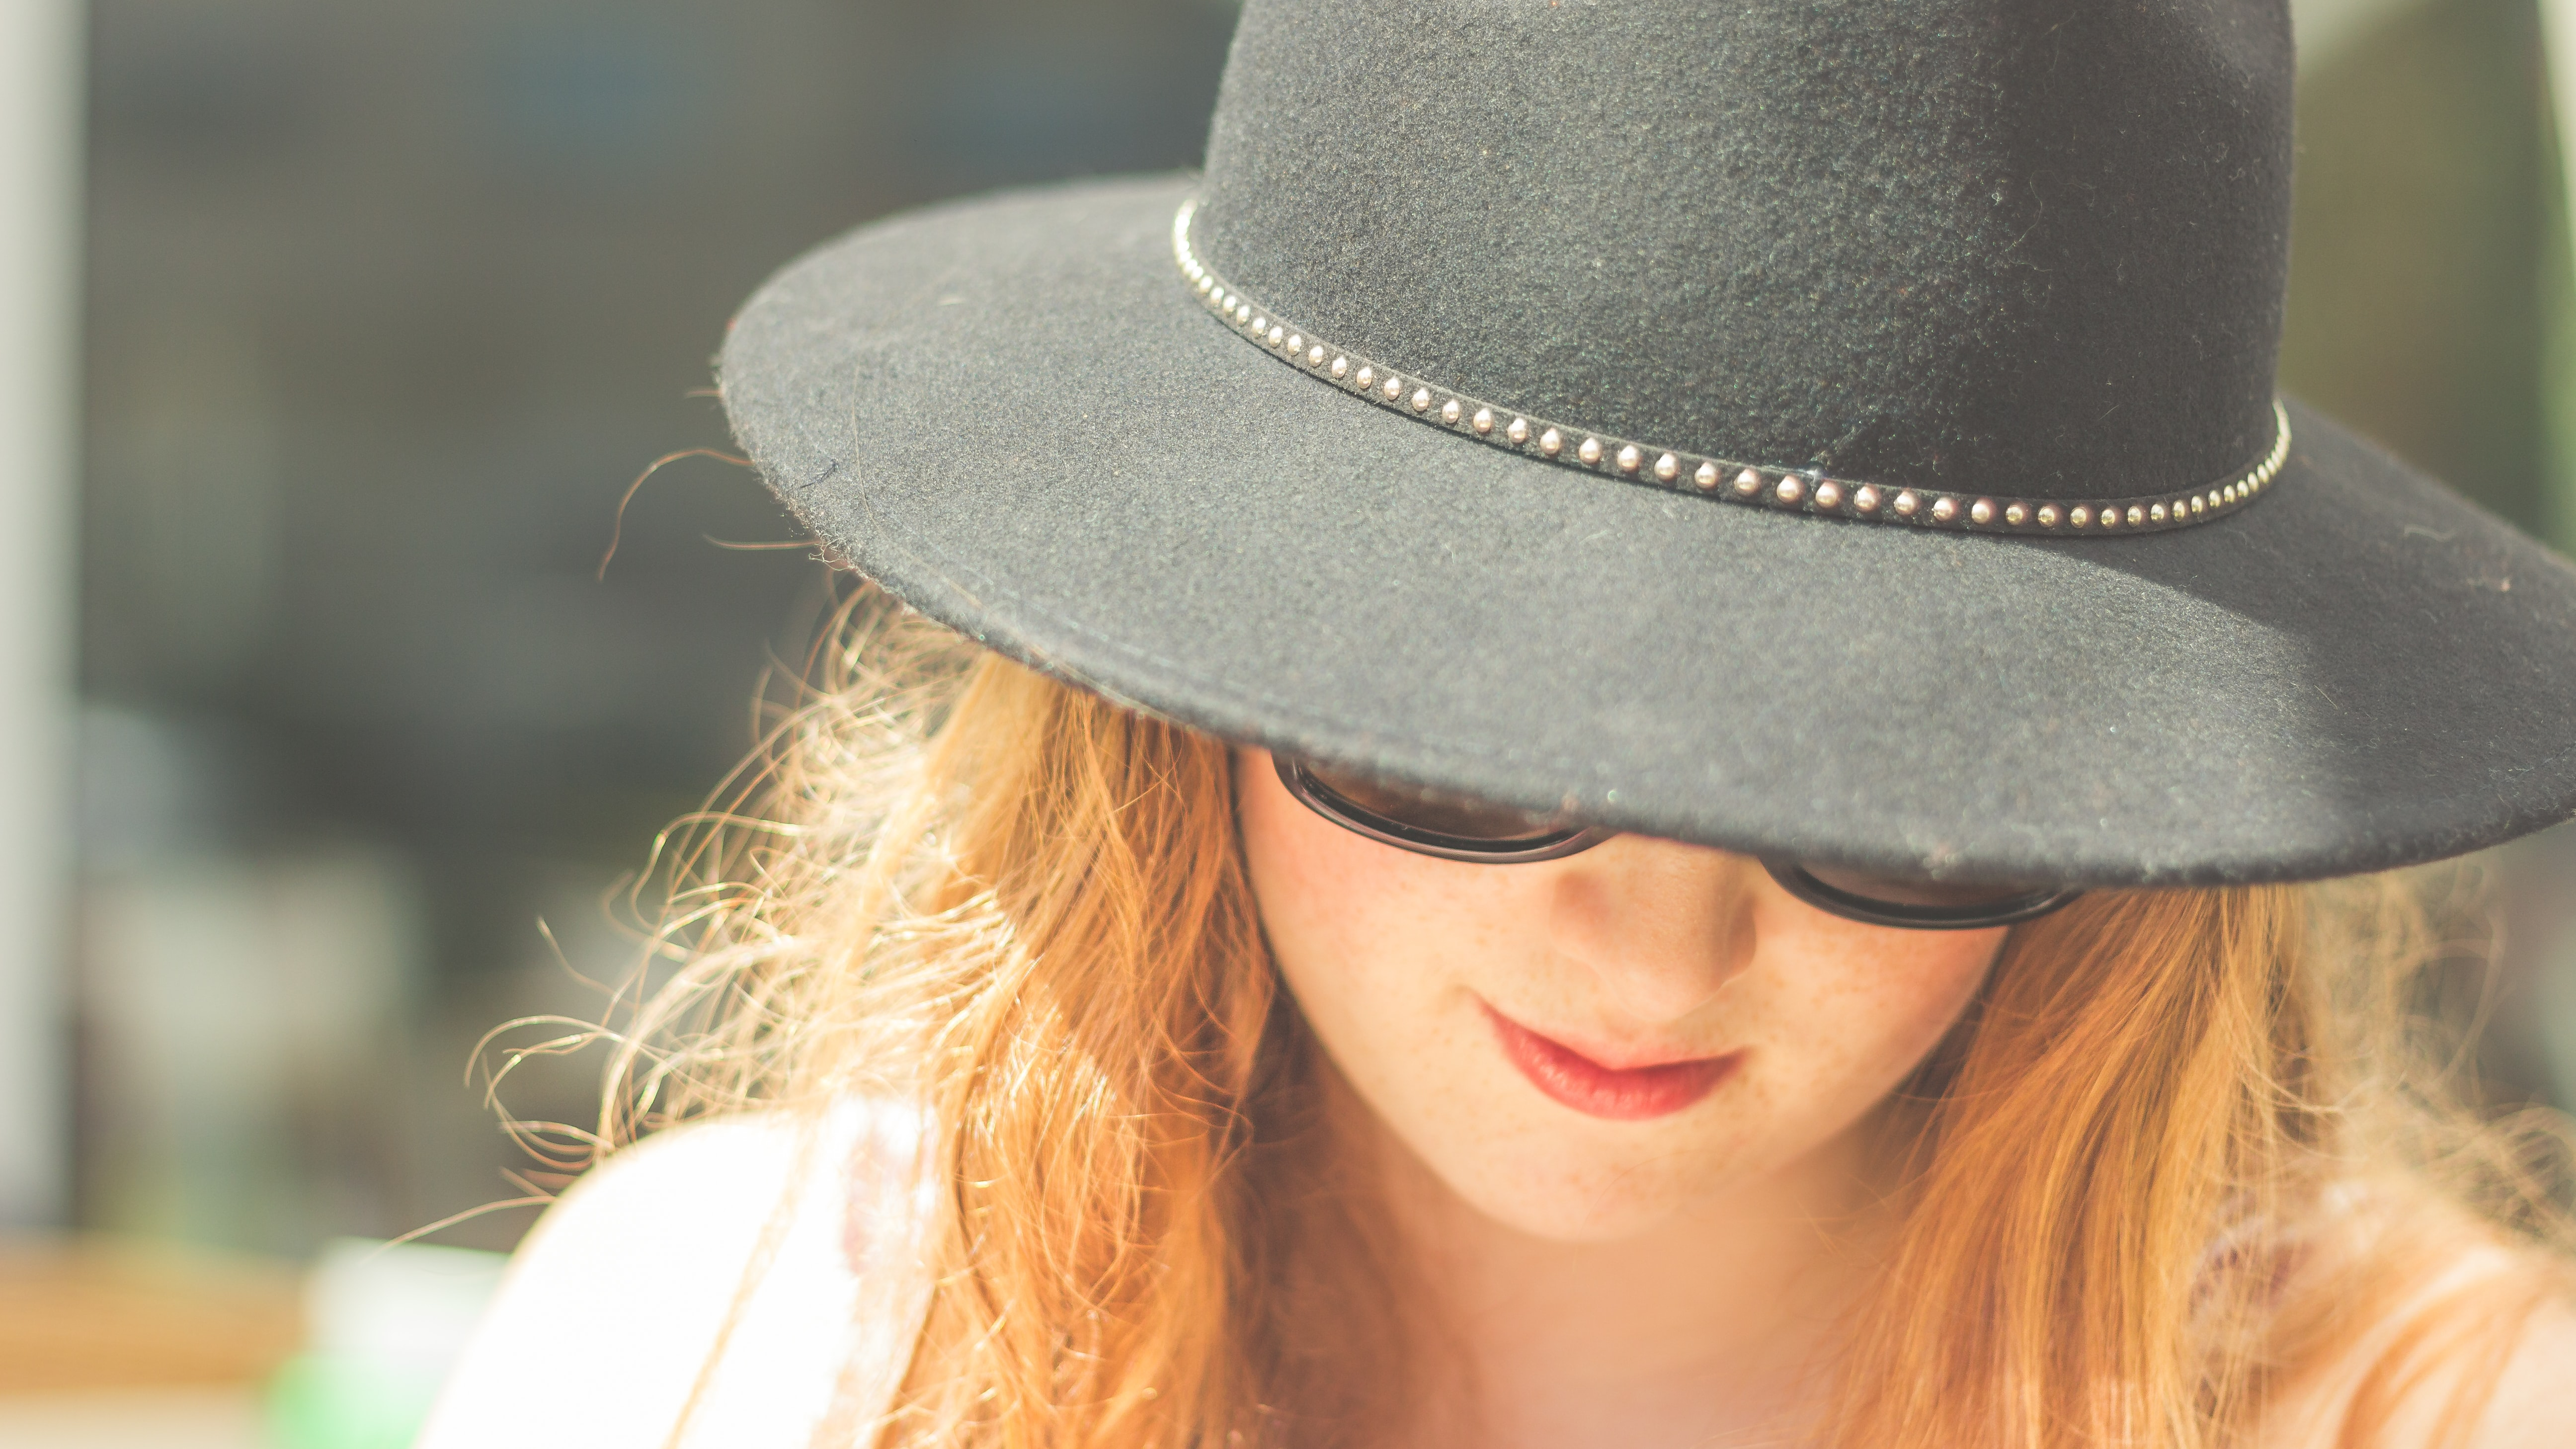 woman looking down wearing black bowler hat